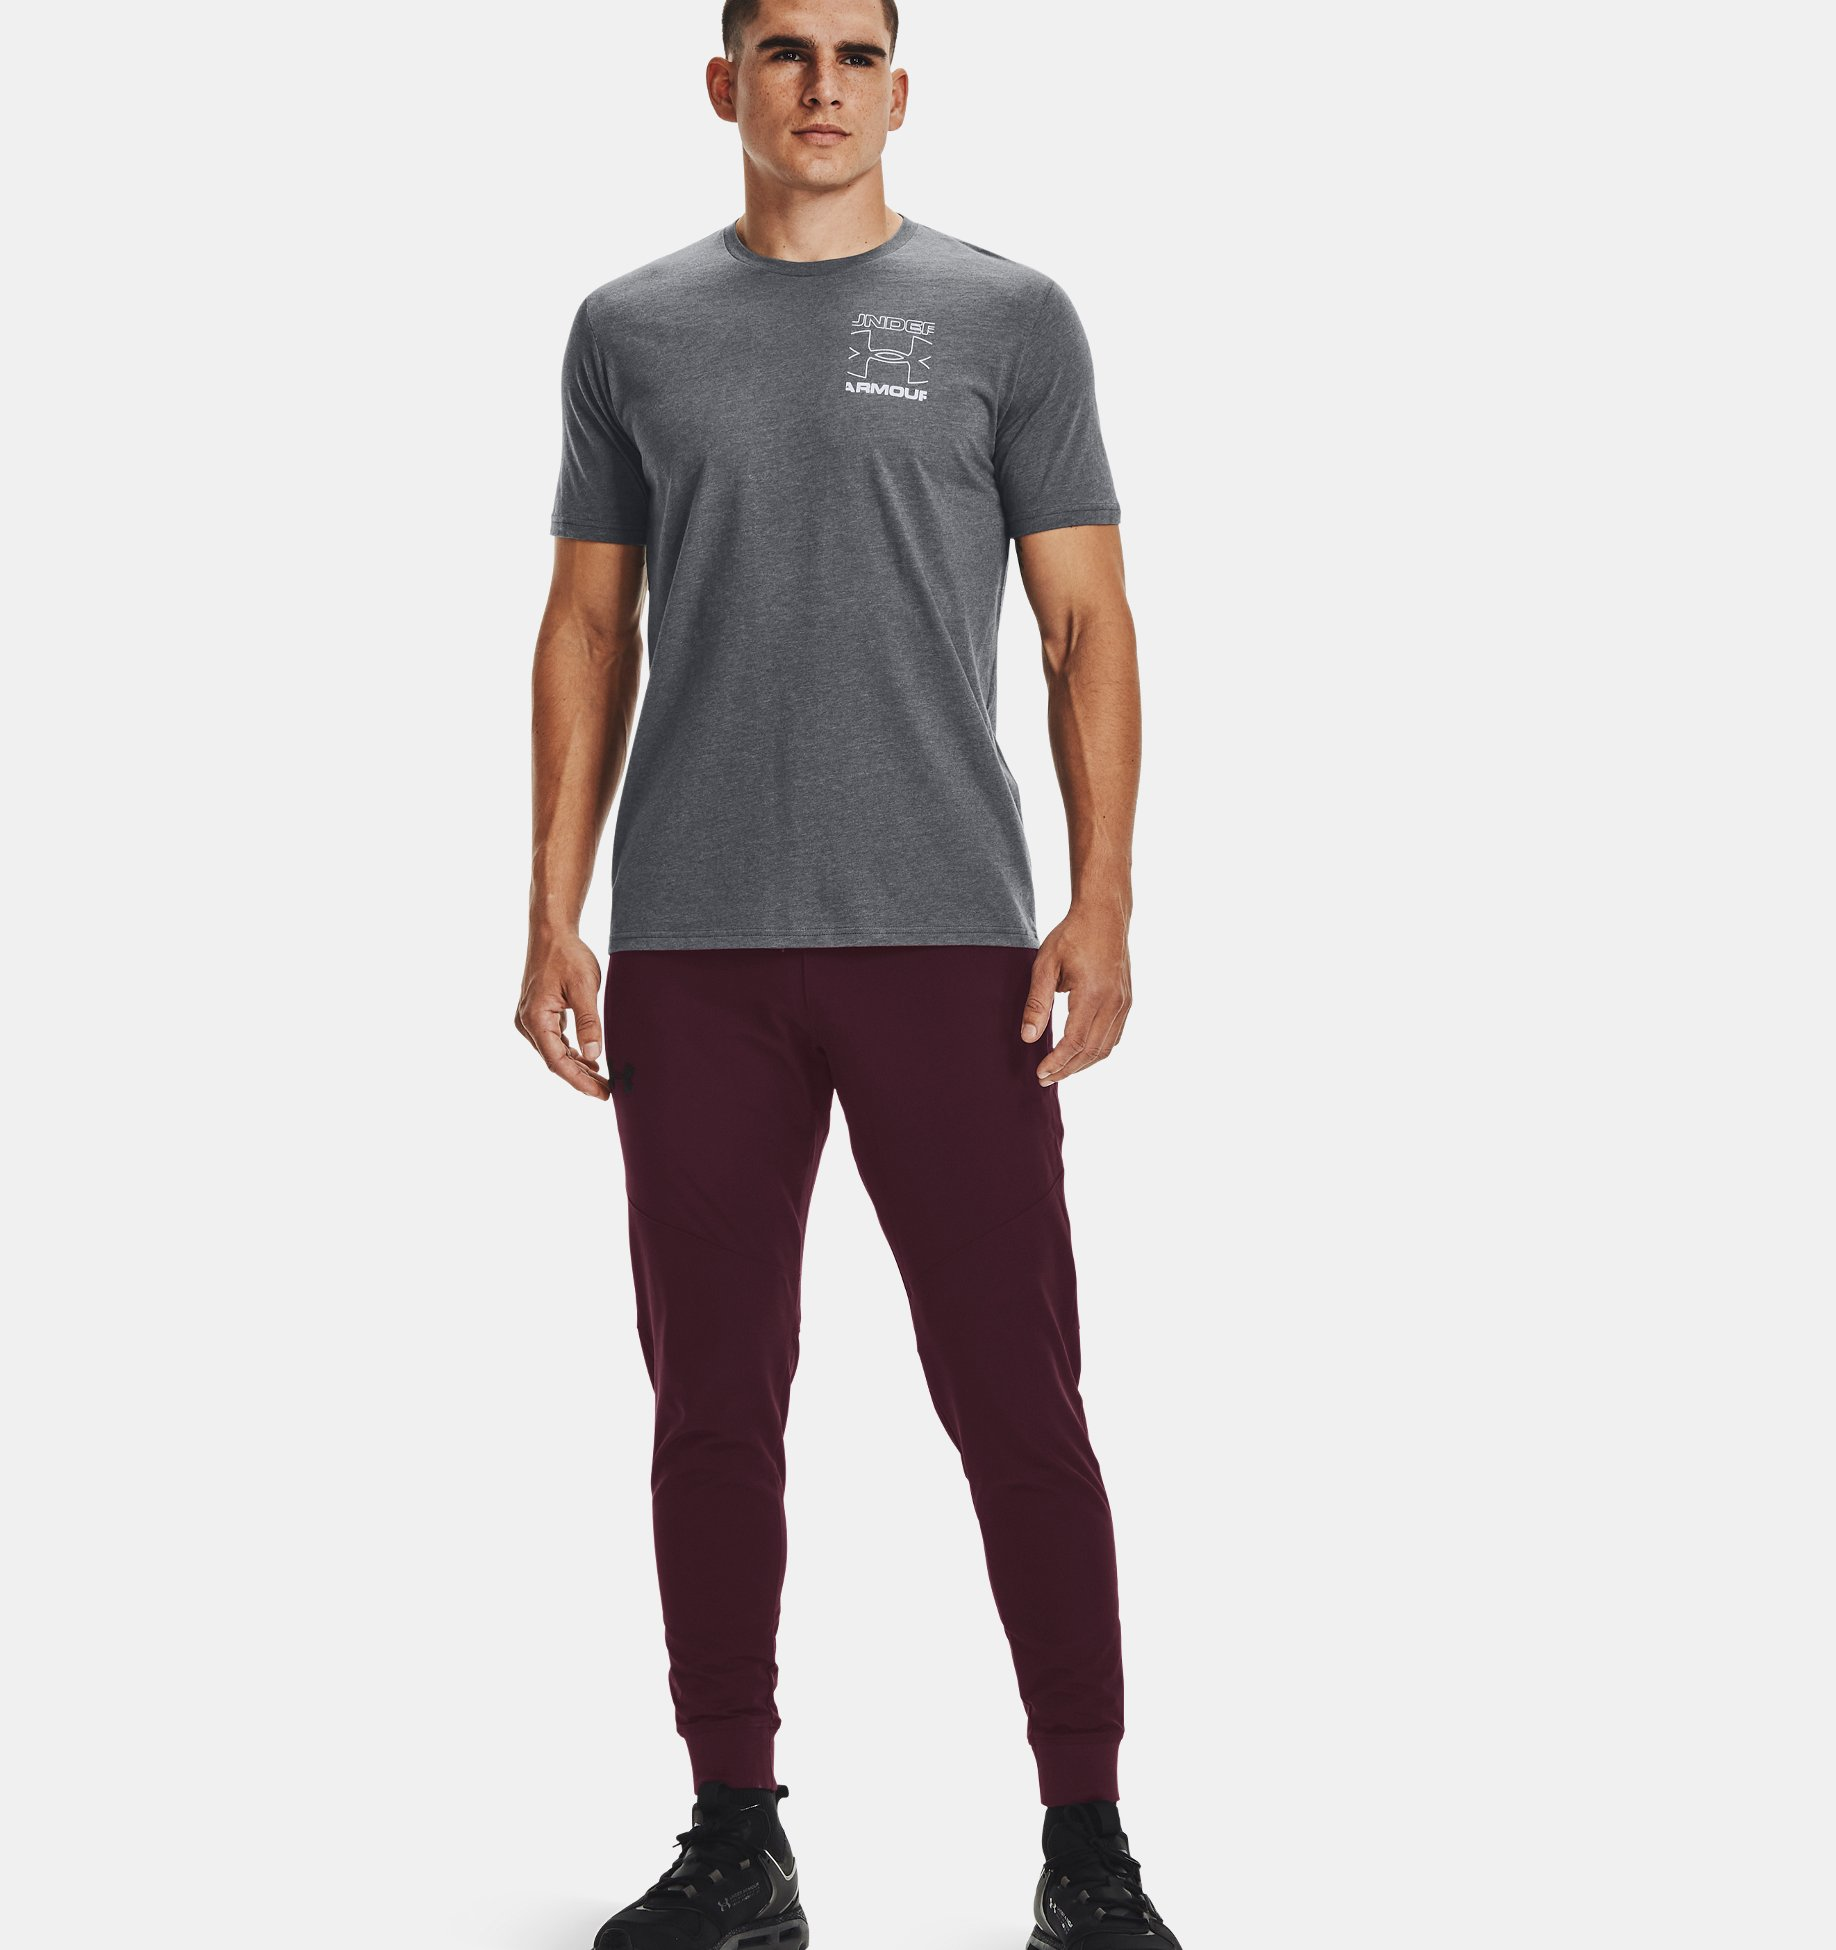 Underarmour Mens UA Branded Crop Short Sleeve